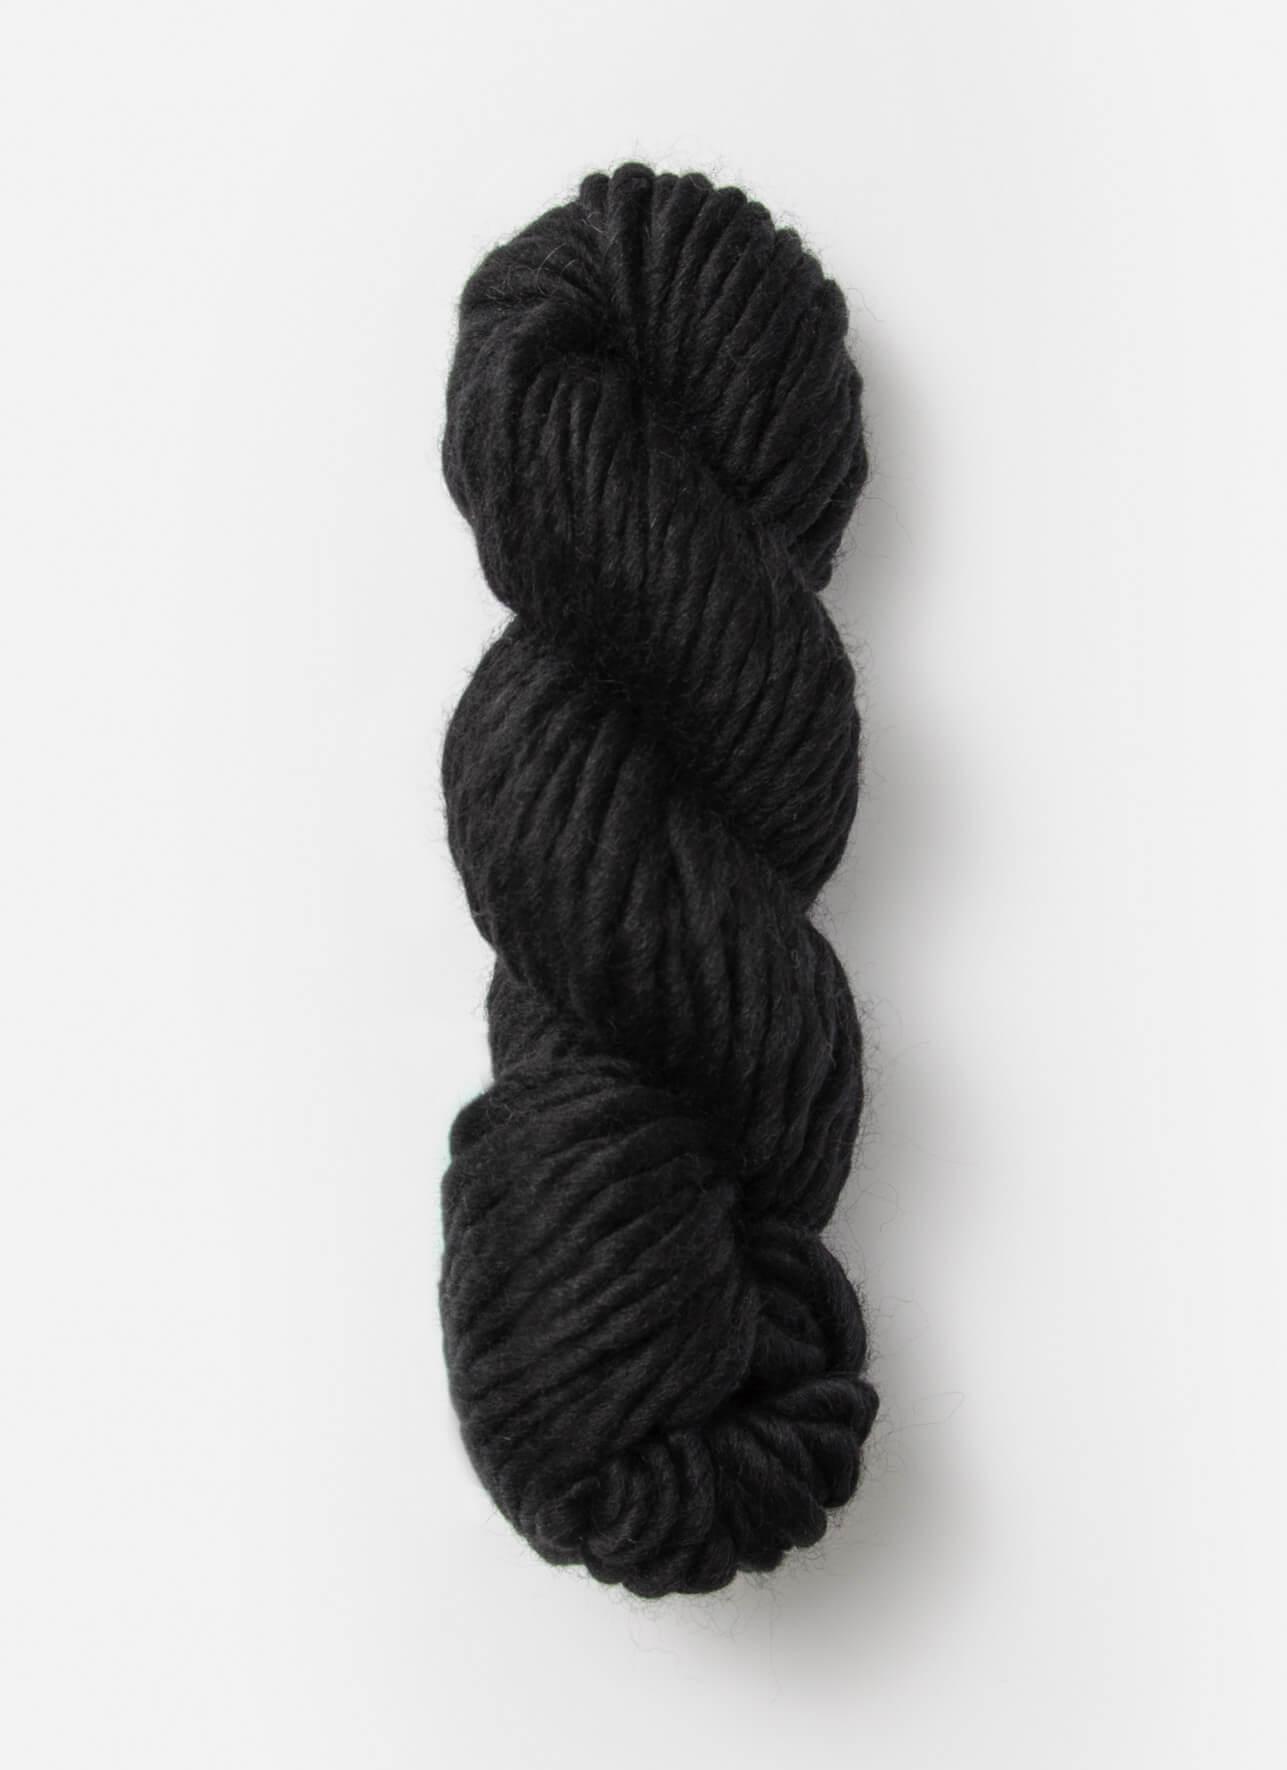 No. 1008: Black Bear